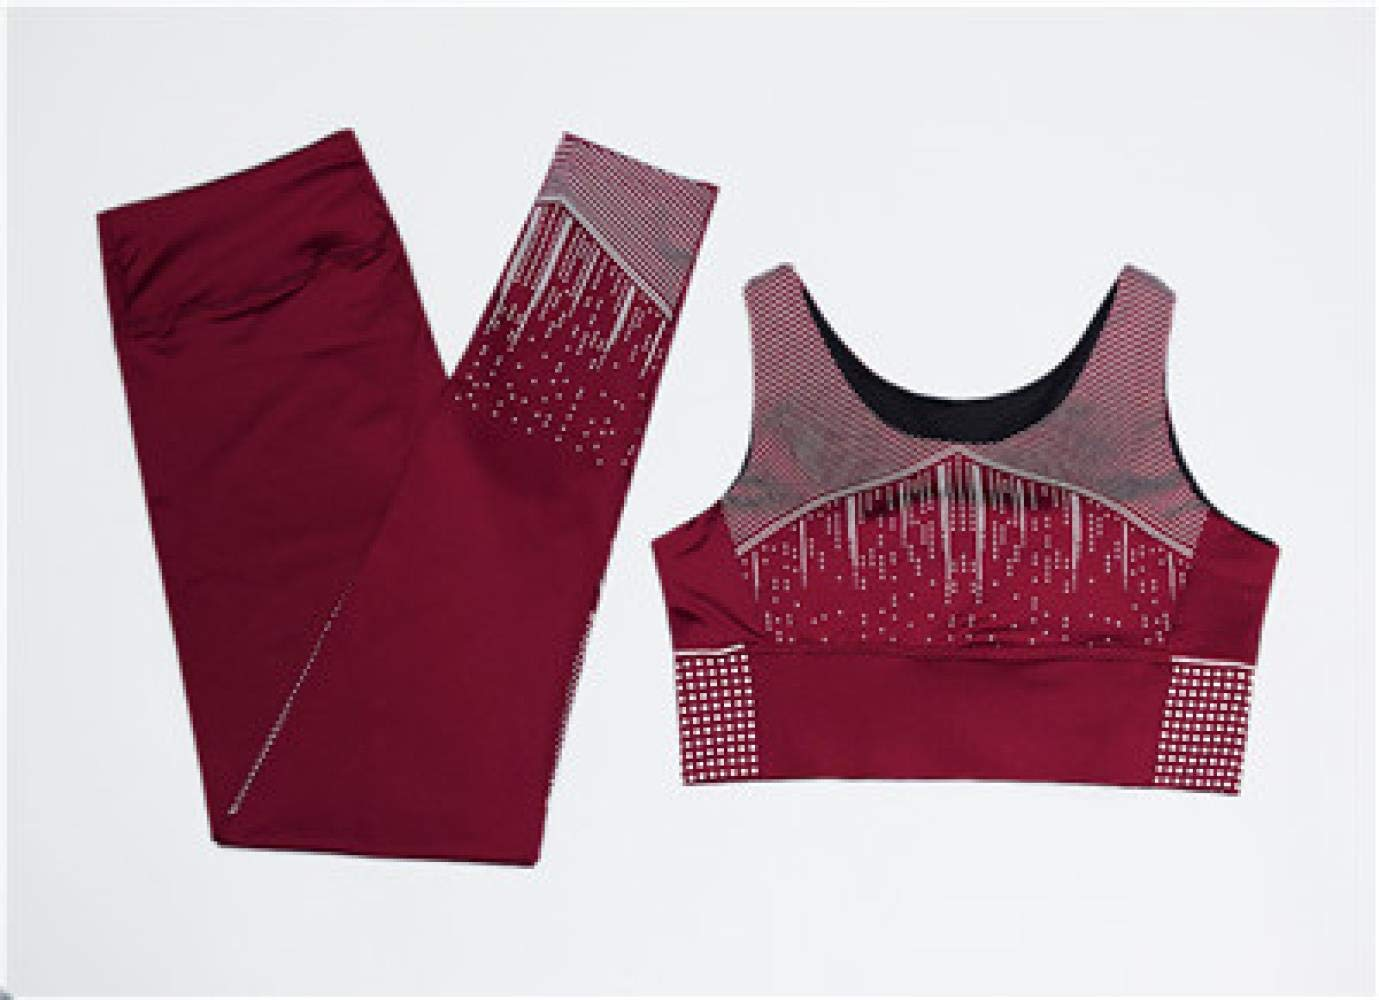 YANGCONG Yoga Fitness Bekleidung Frauen Yoga Set Weste + Strumpfhose Sportbekleidung Gym Sport BH Hosen Fitness Sport Anzug Laufbekleidung 2 STÜCKE dunkelrot M